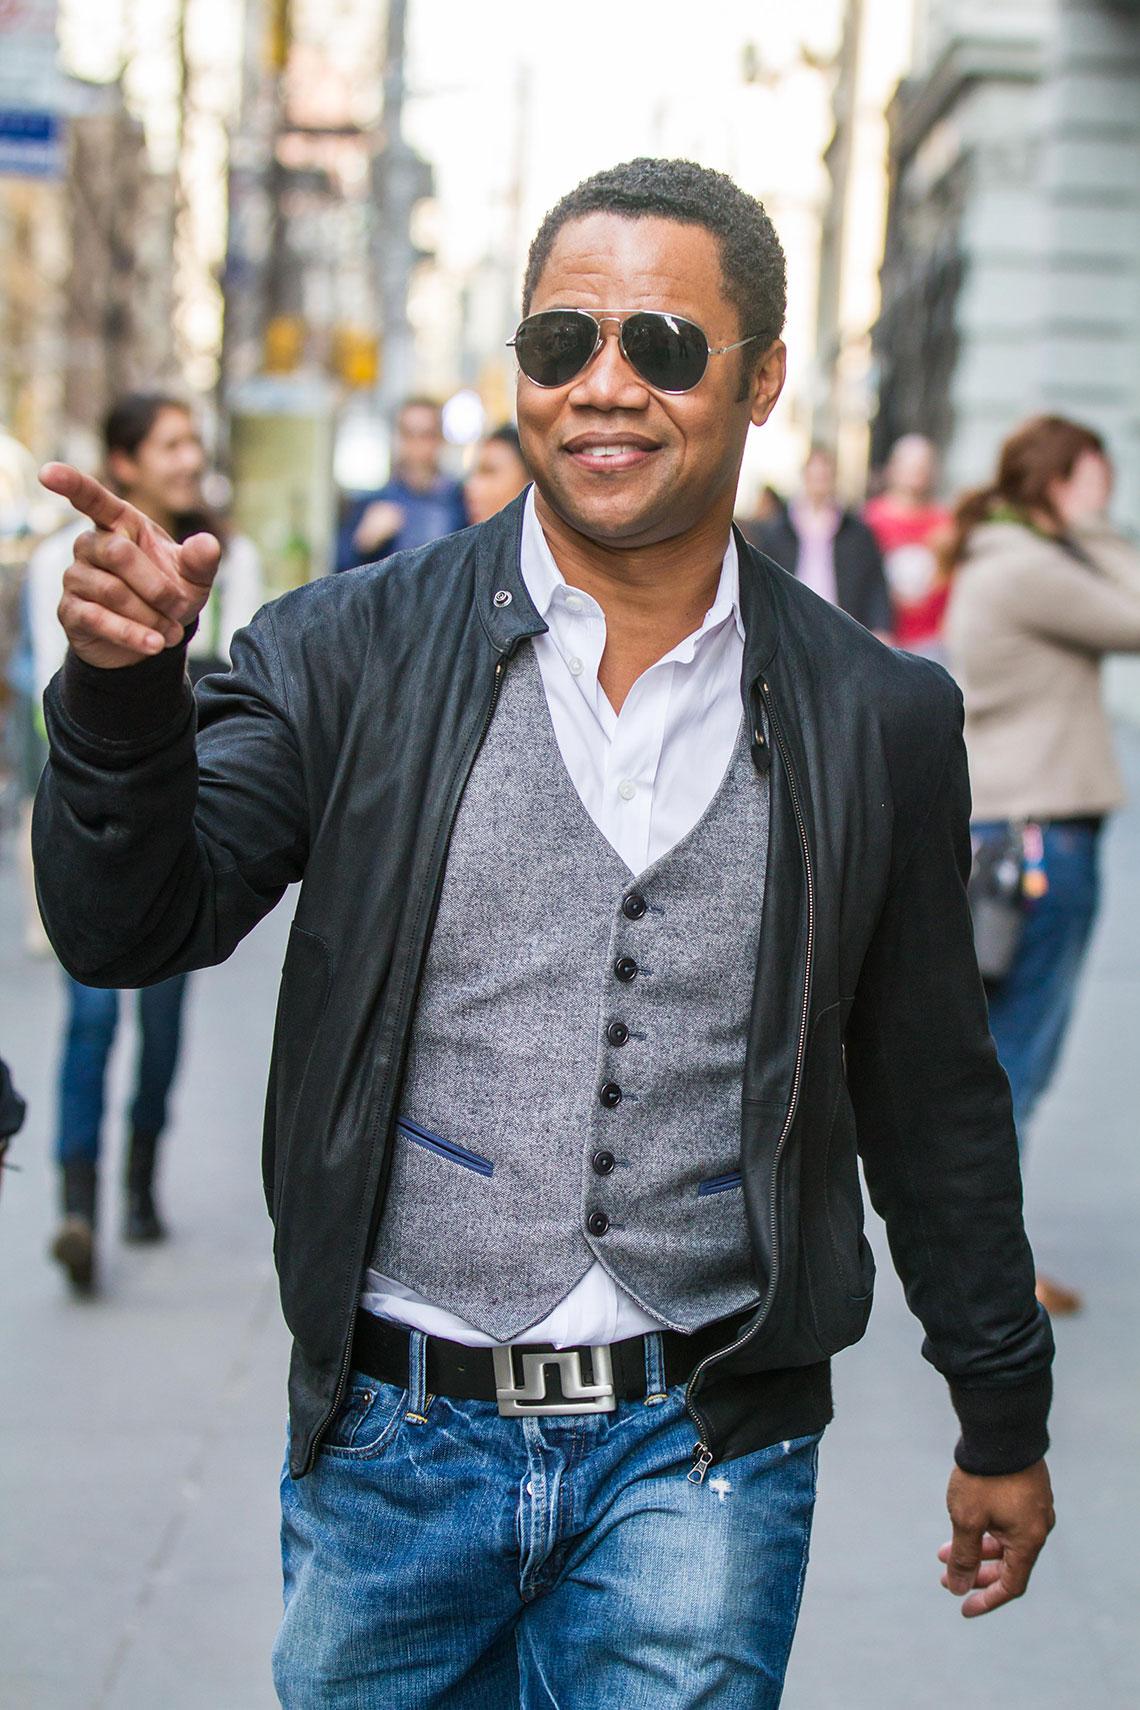 Jeans Hombres Guía 50 De Para Mayores T3l5uFcKJ1